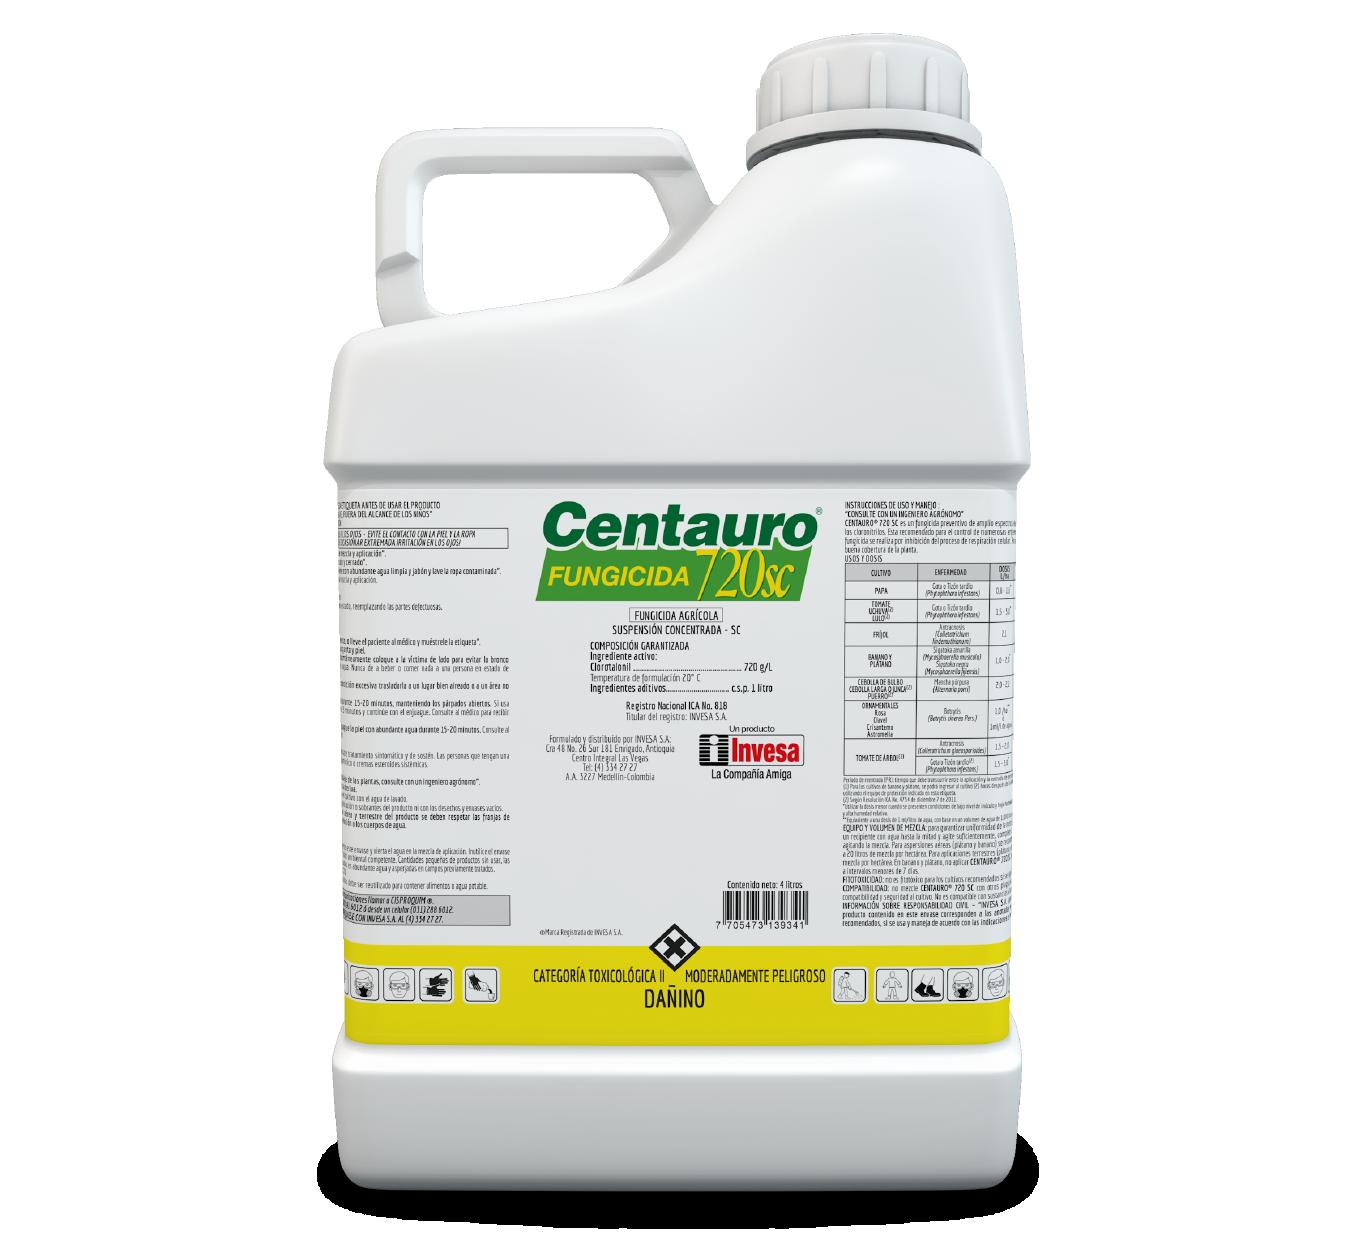 Fungicida centauro 720 sc invesa 4 litros